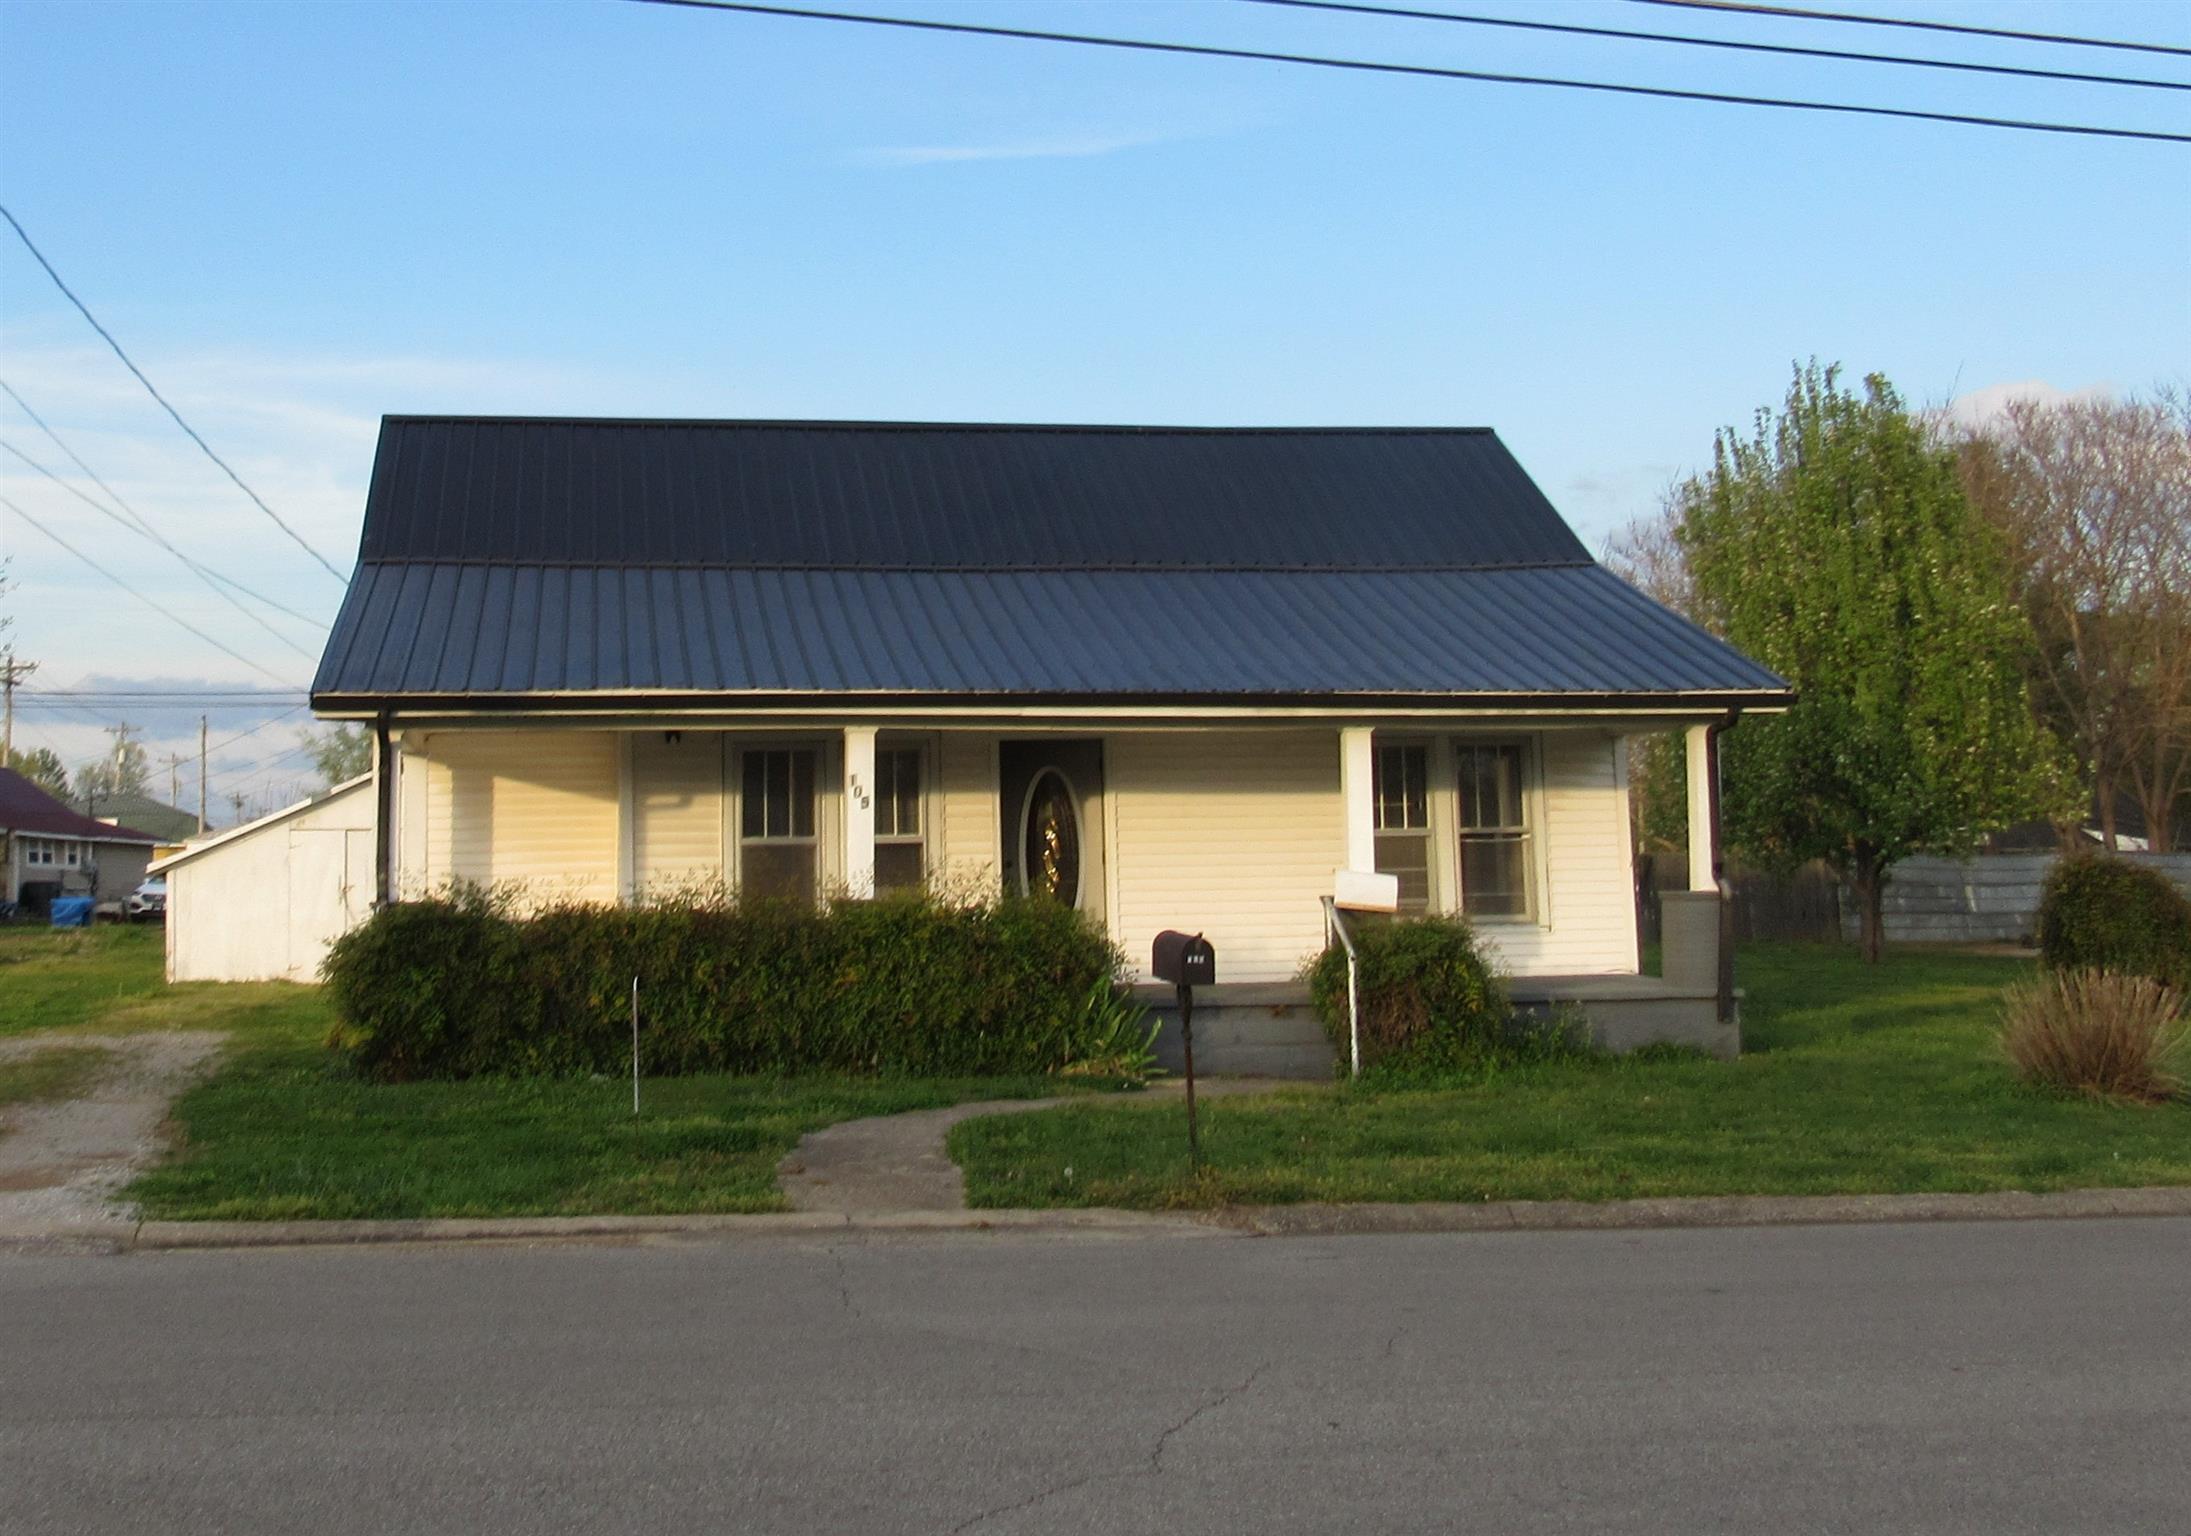 105 Edison St, McMinnville, TN 37110 - McMinnville, TN real estate listing